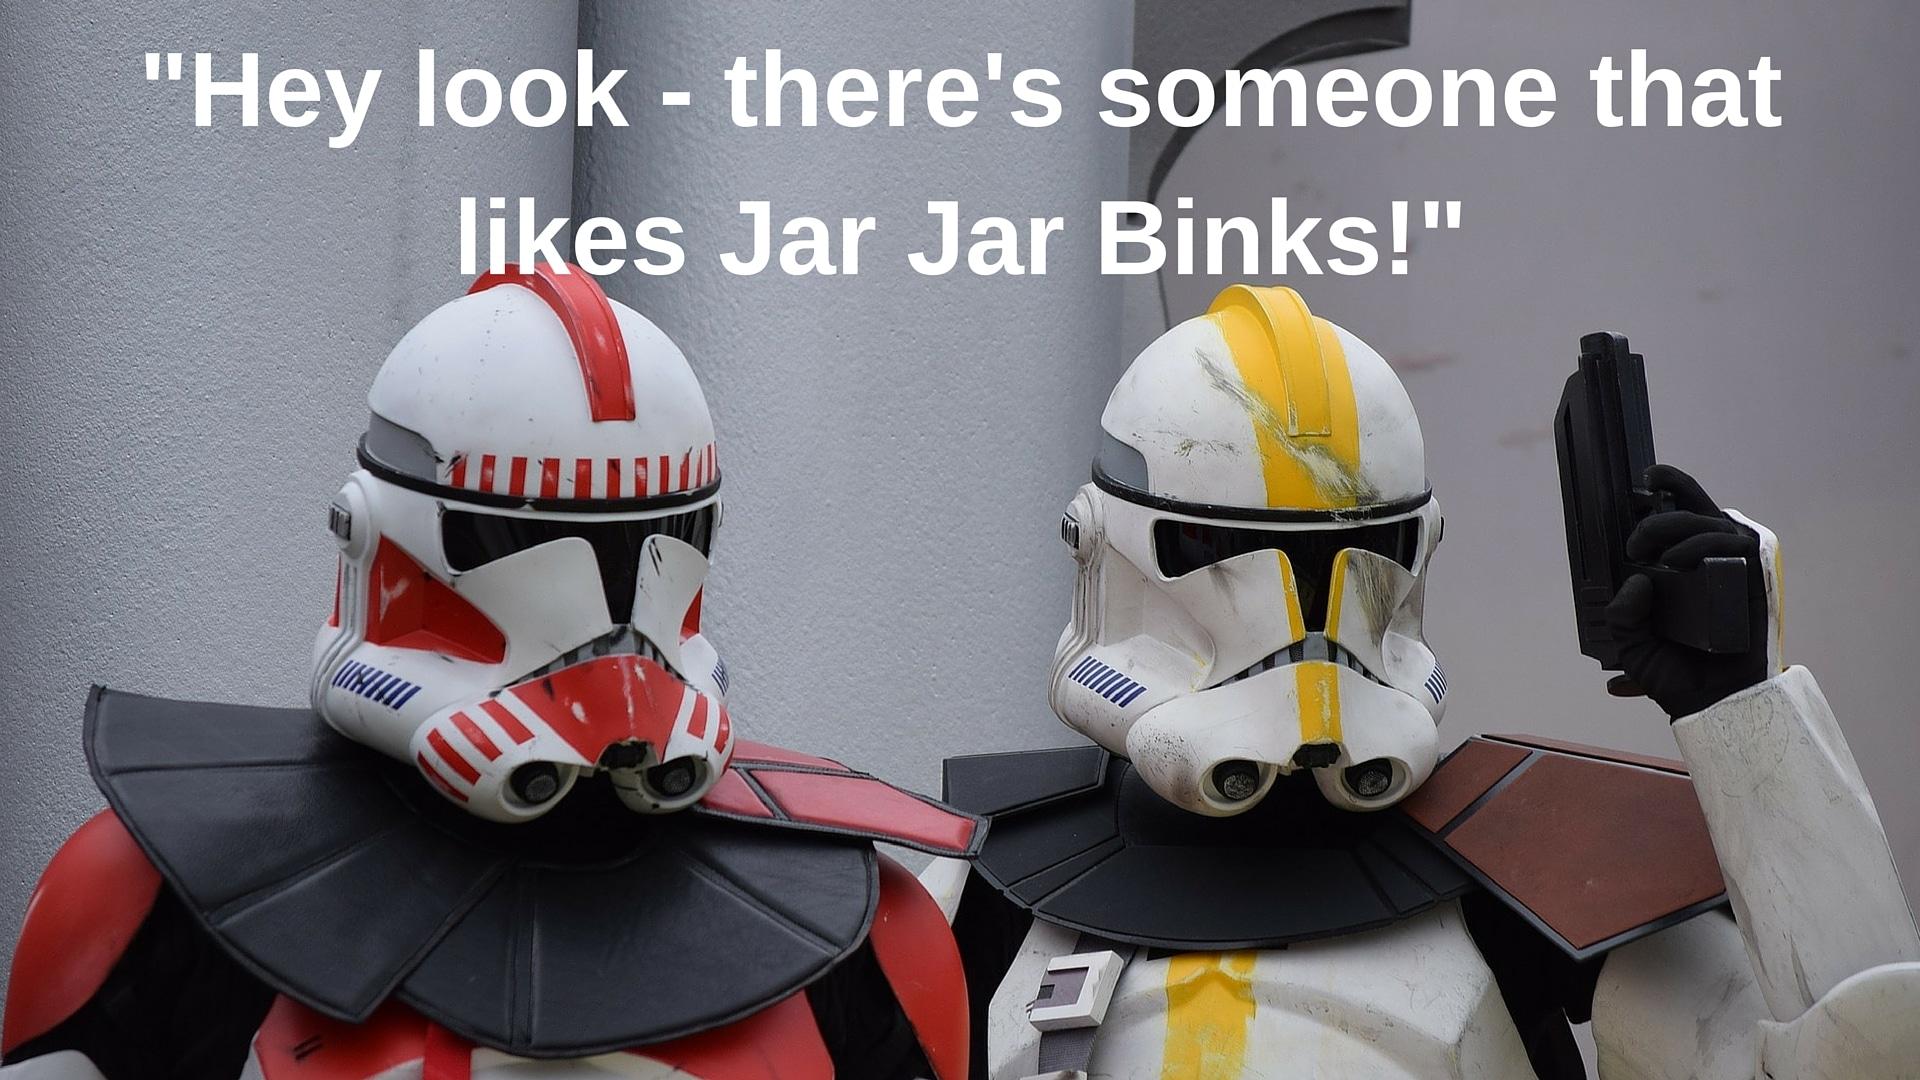 Hey look - there's someone that likes Jar Jar Binks!